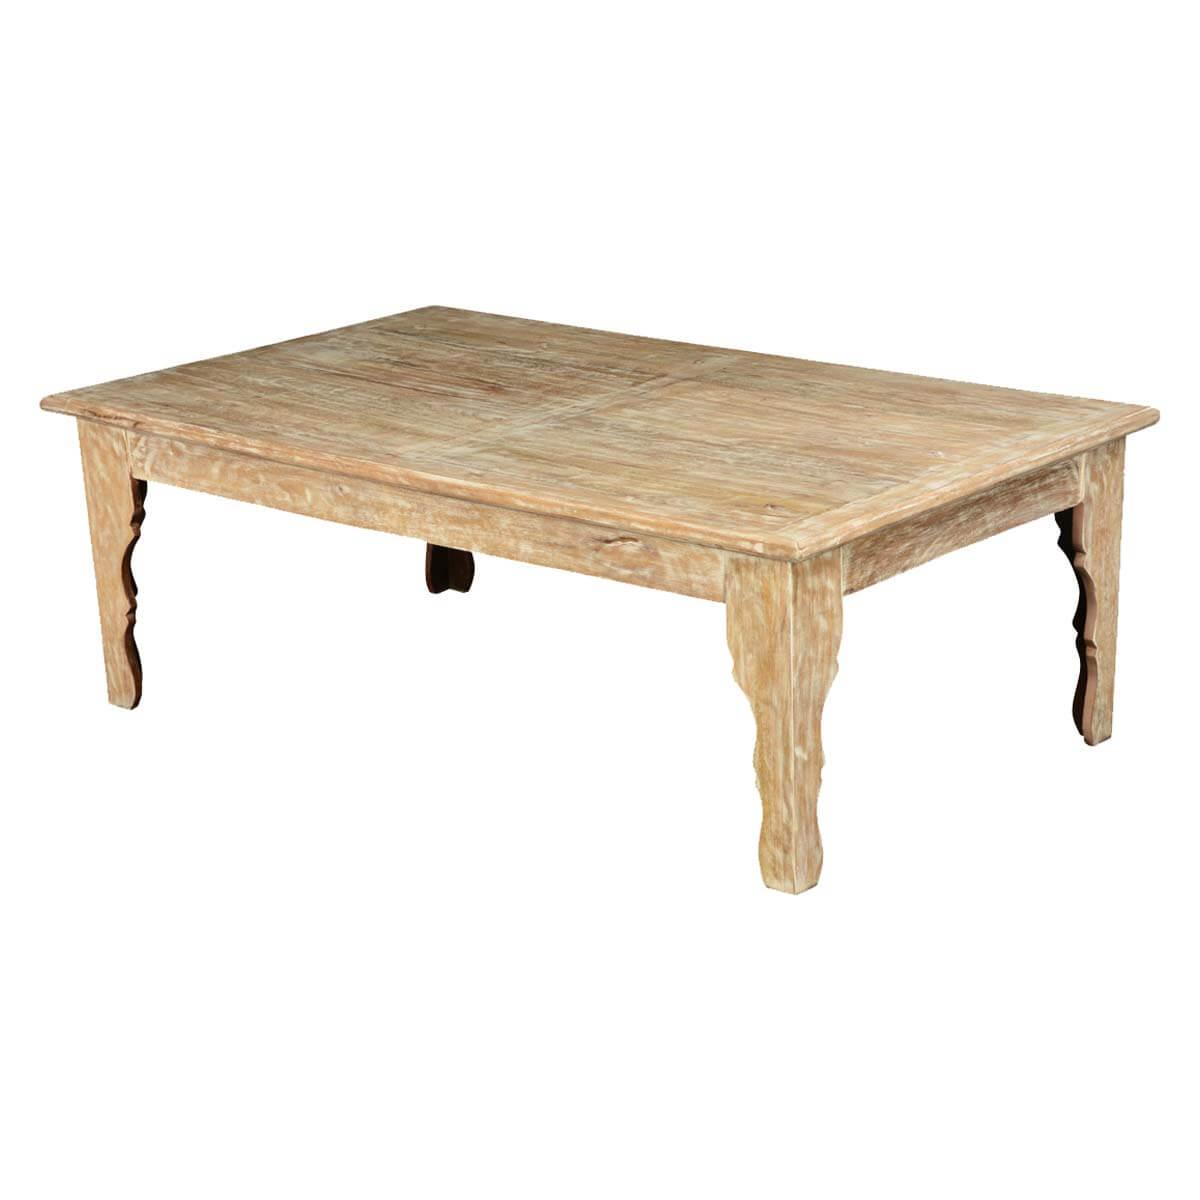 Startling Winter Mango Wood Rustic Coffee Table Rustic Coffee Table Plans Rustic Coffee Table Trunk houzz 01 Rustic Coffee Table